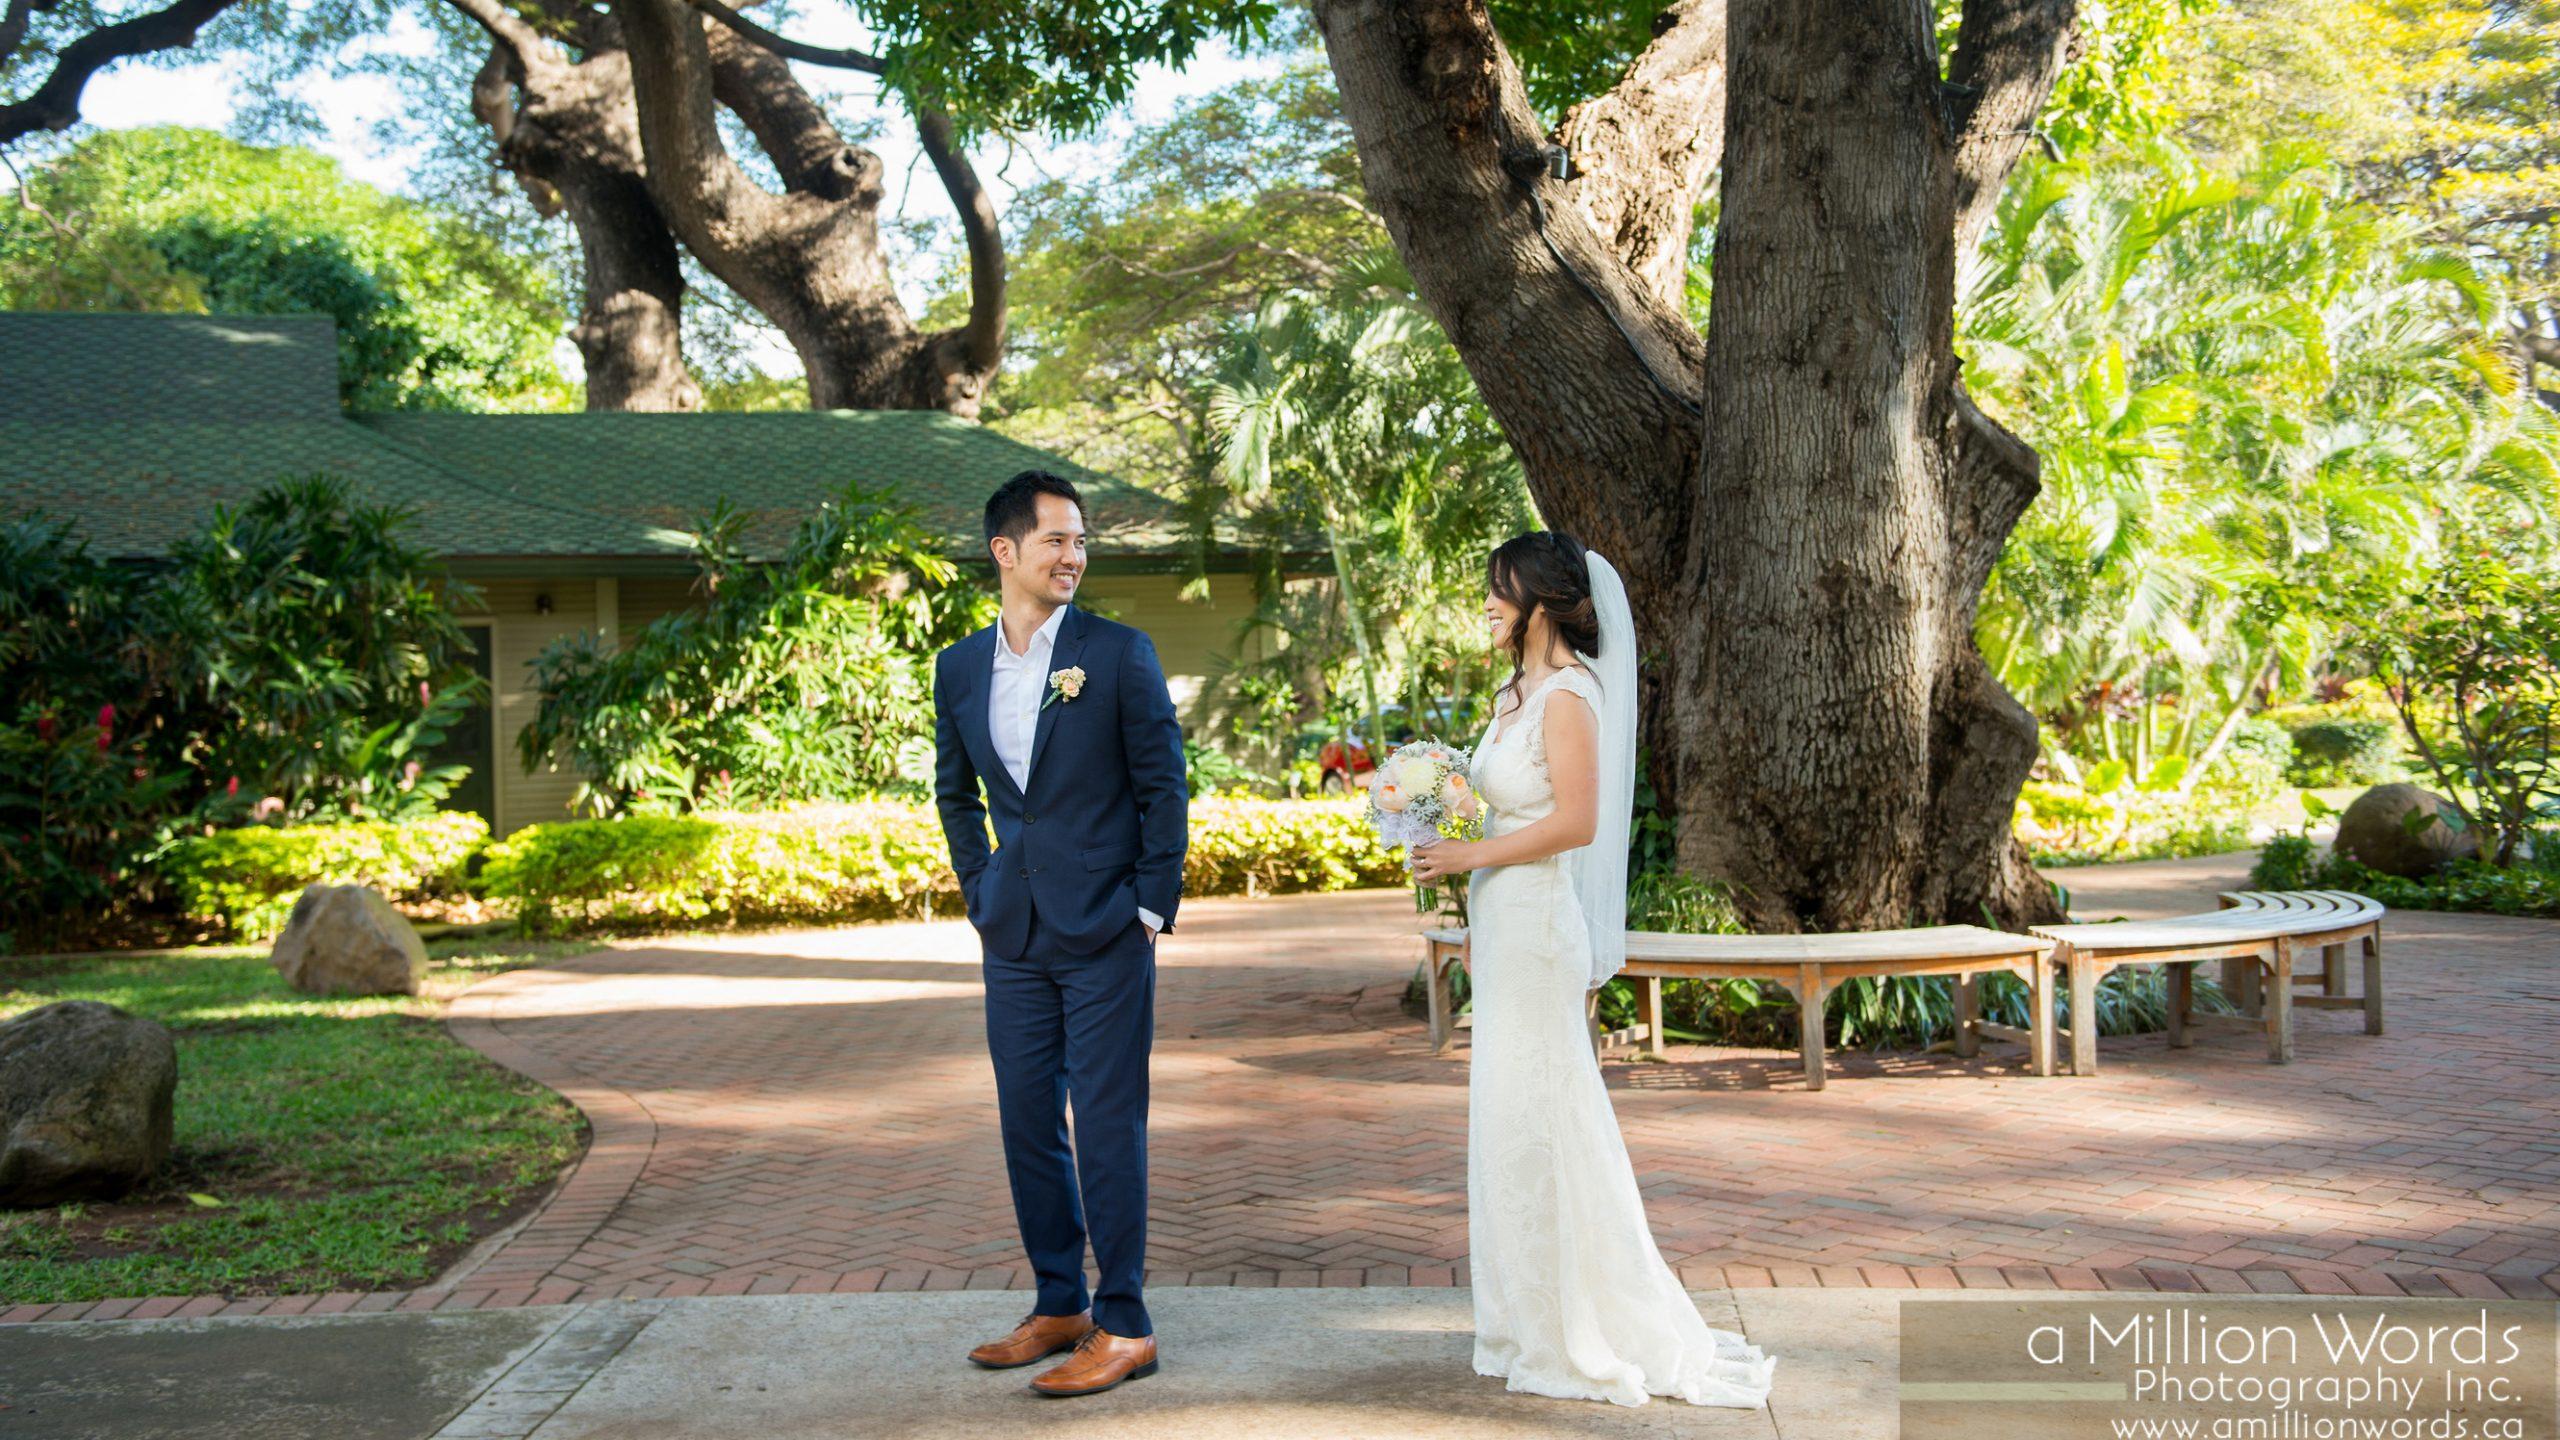 kw_destination_wedding_photography18